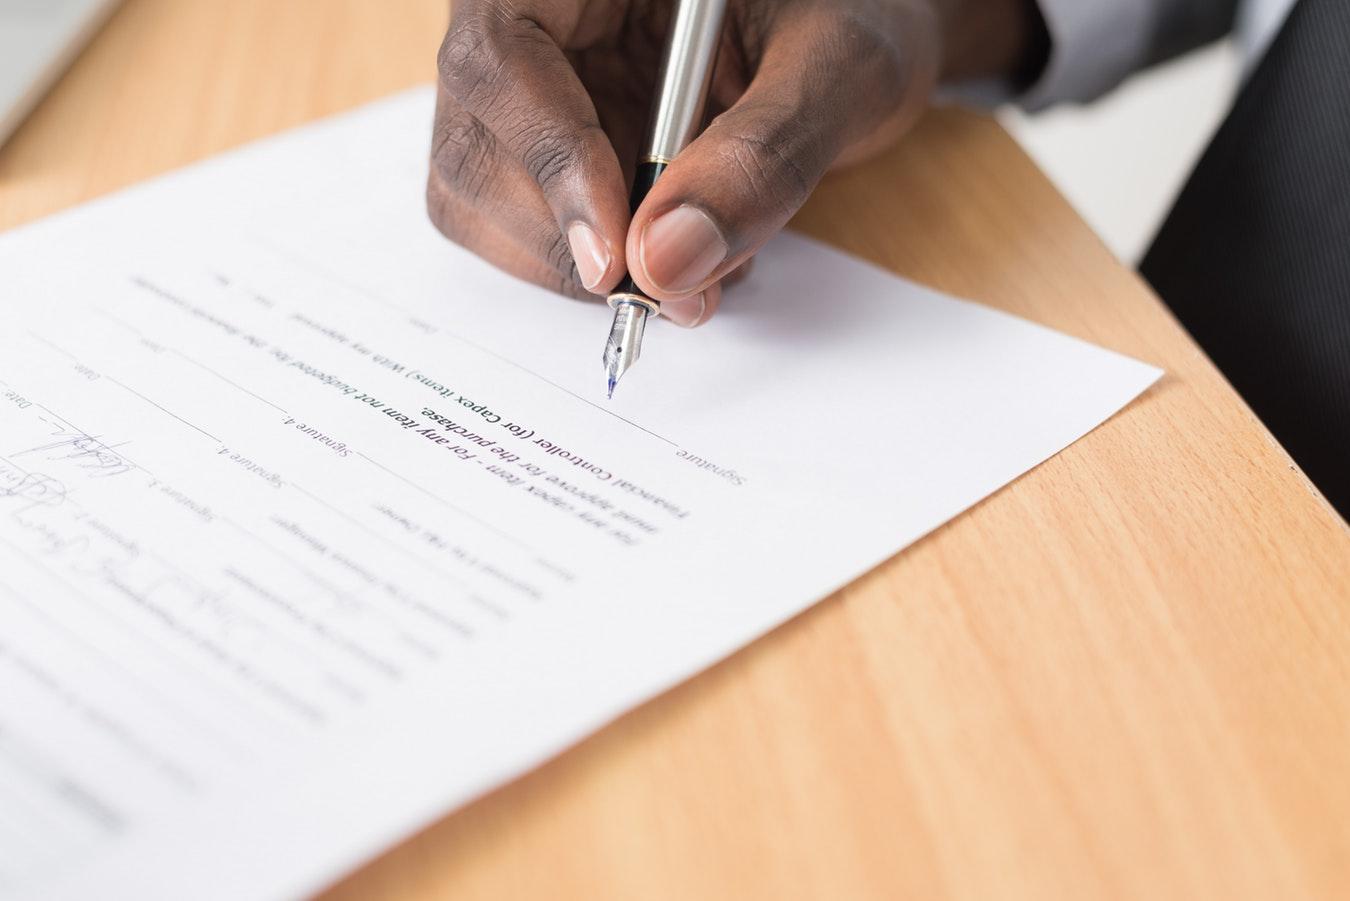 relator signing qui tam attorney fee contract